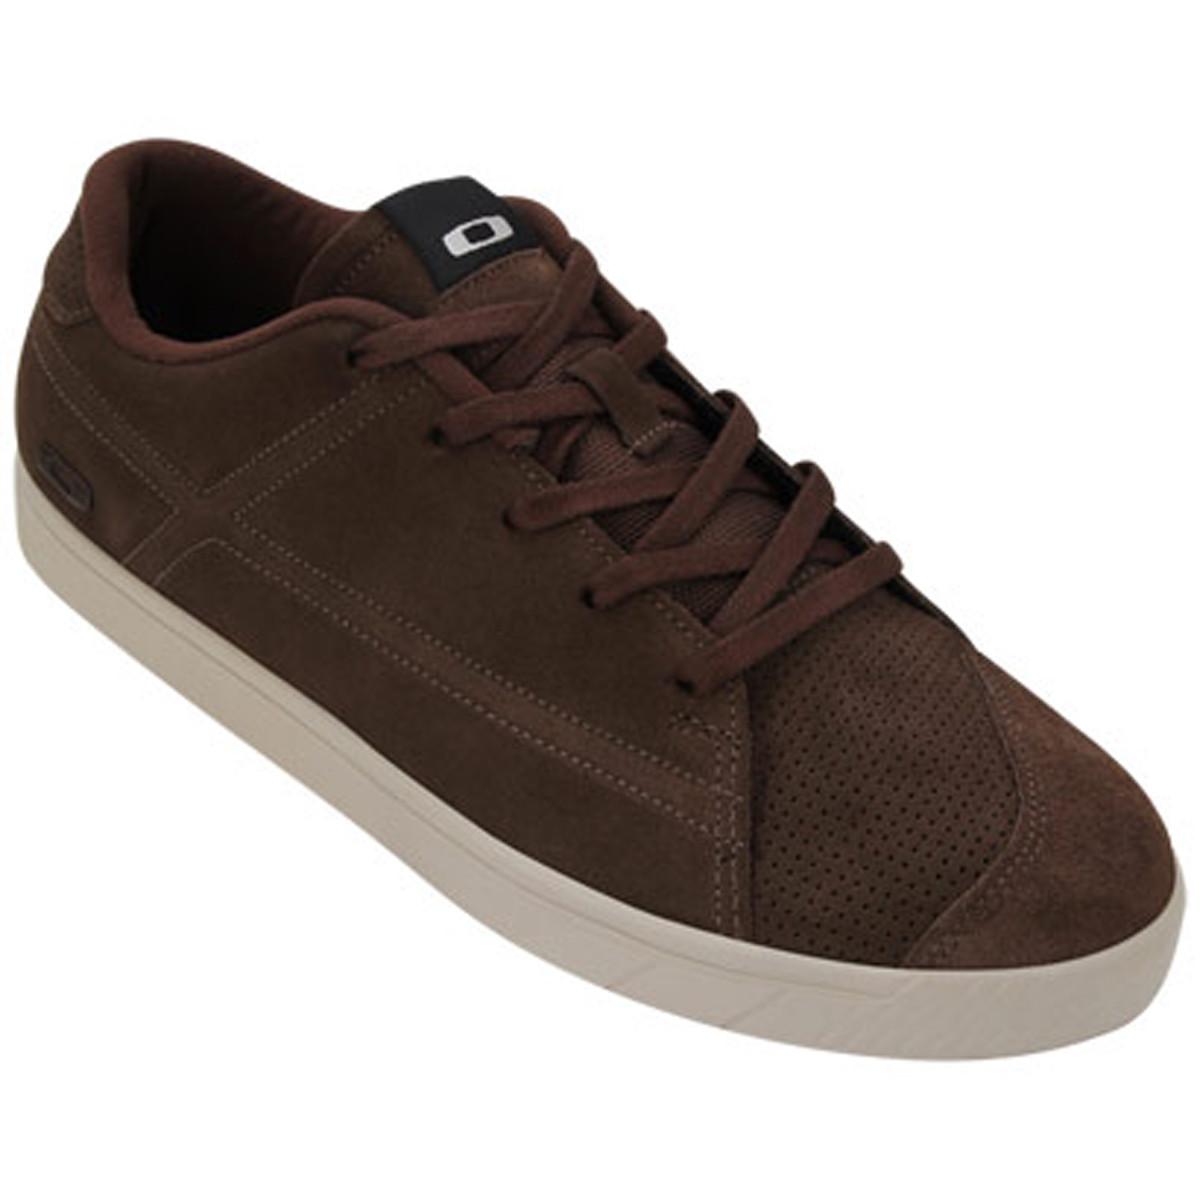 Tenis Oakley Tracks Chocolate PROMOÇÃO Ultima Peça tam 40 ref 13167-897 6a4b34bfff910